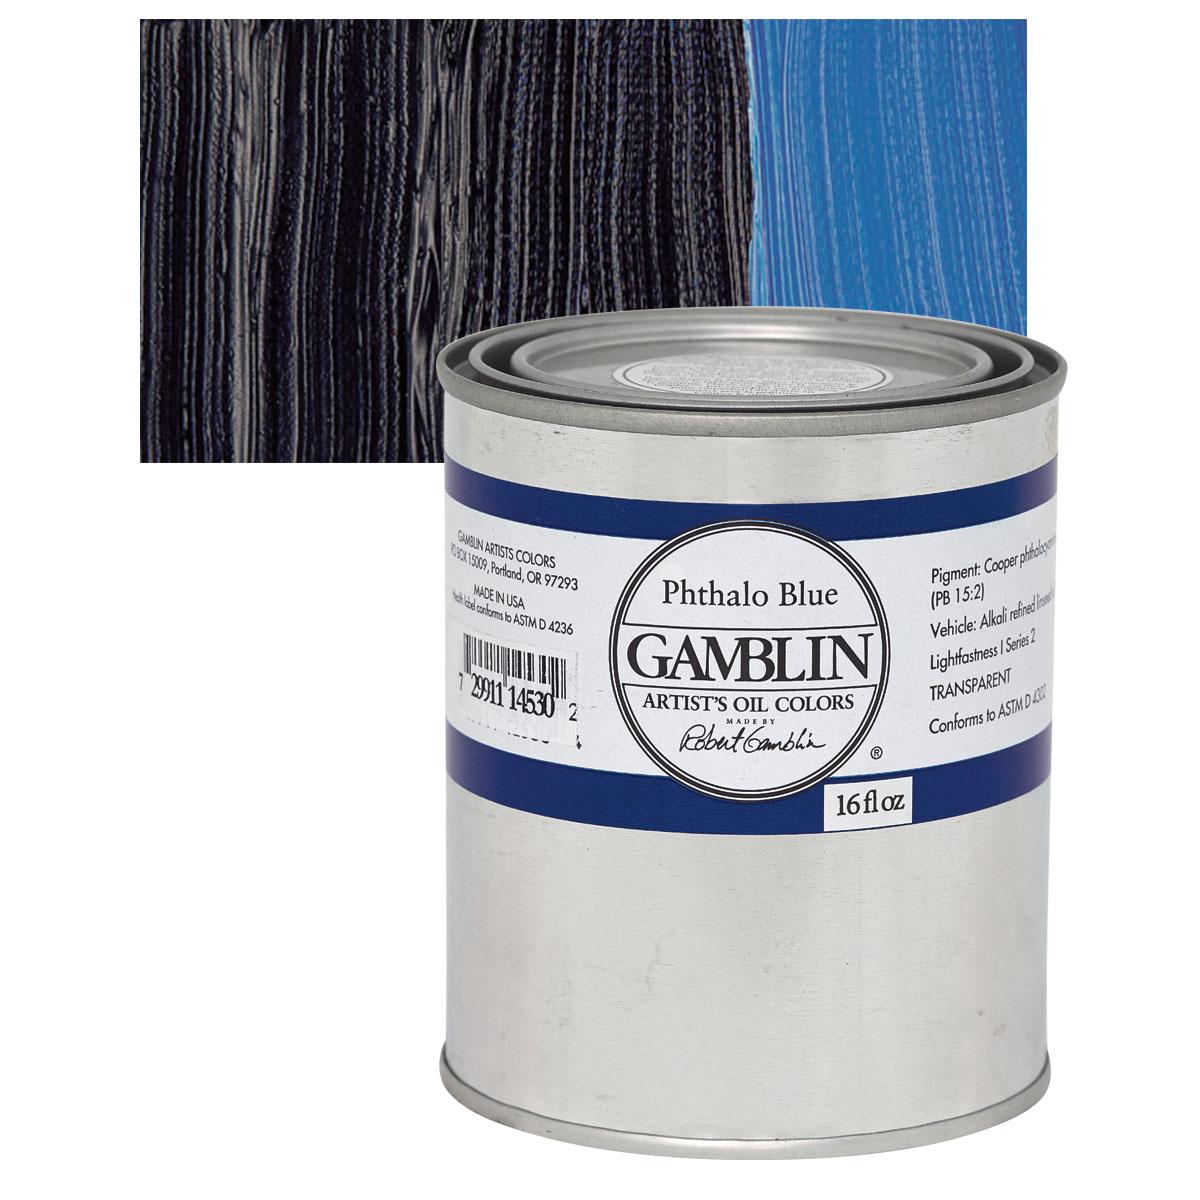 00401 5146 Gamblin Artists Oil Colors Blick Art Materials Pantane Color